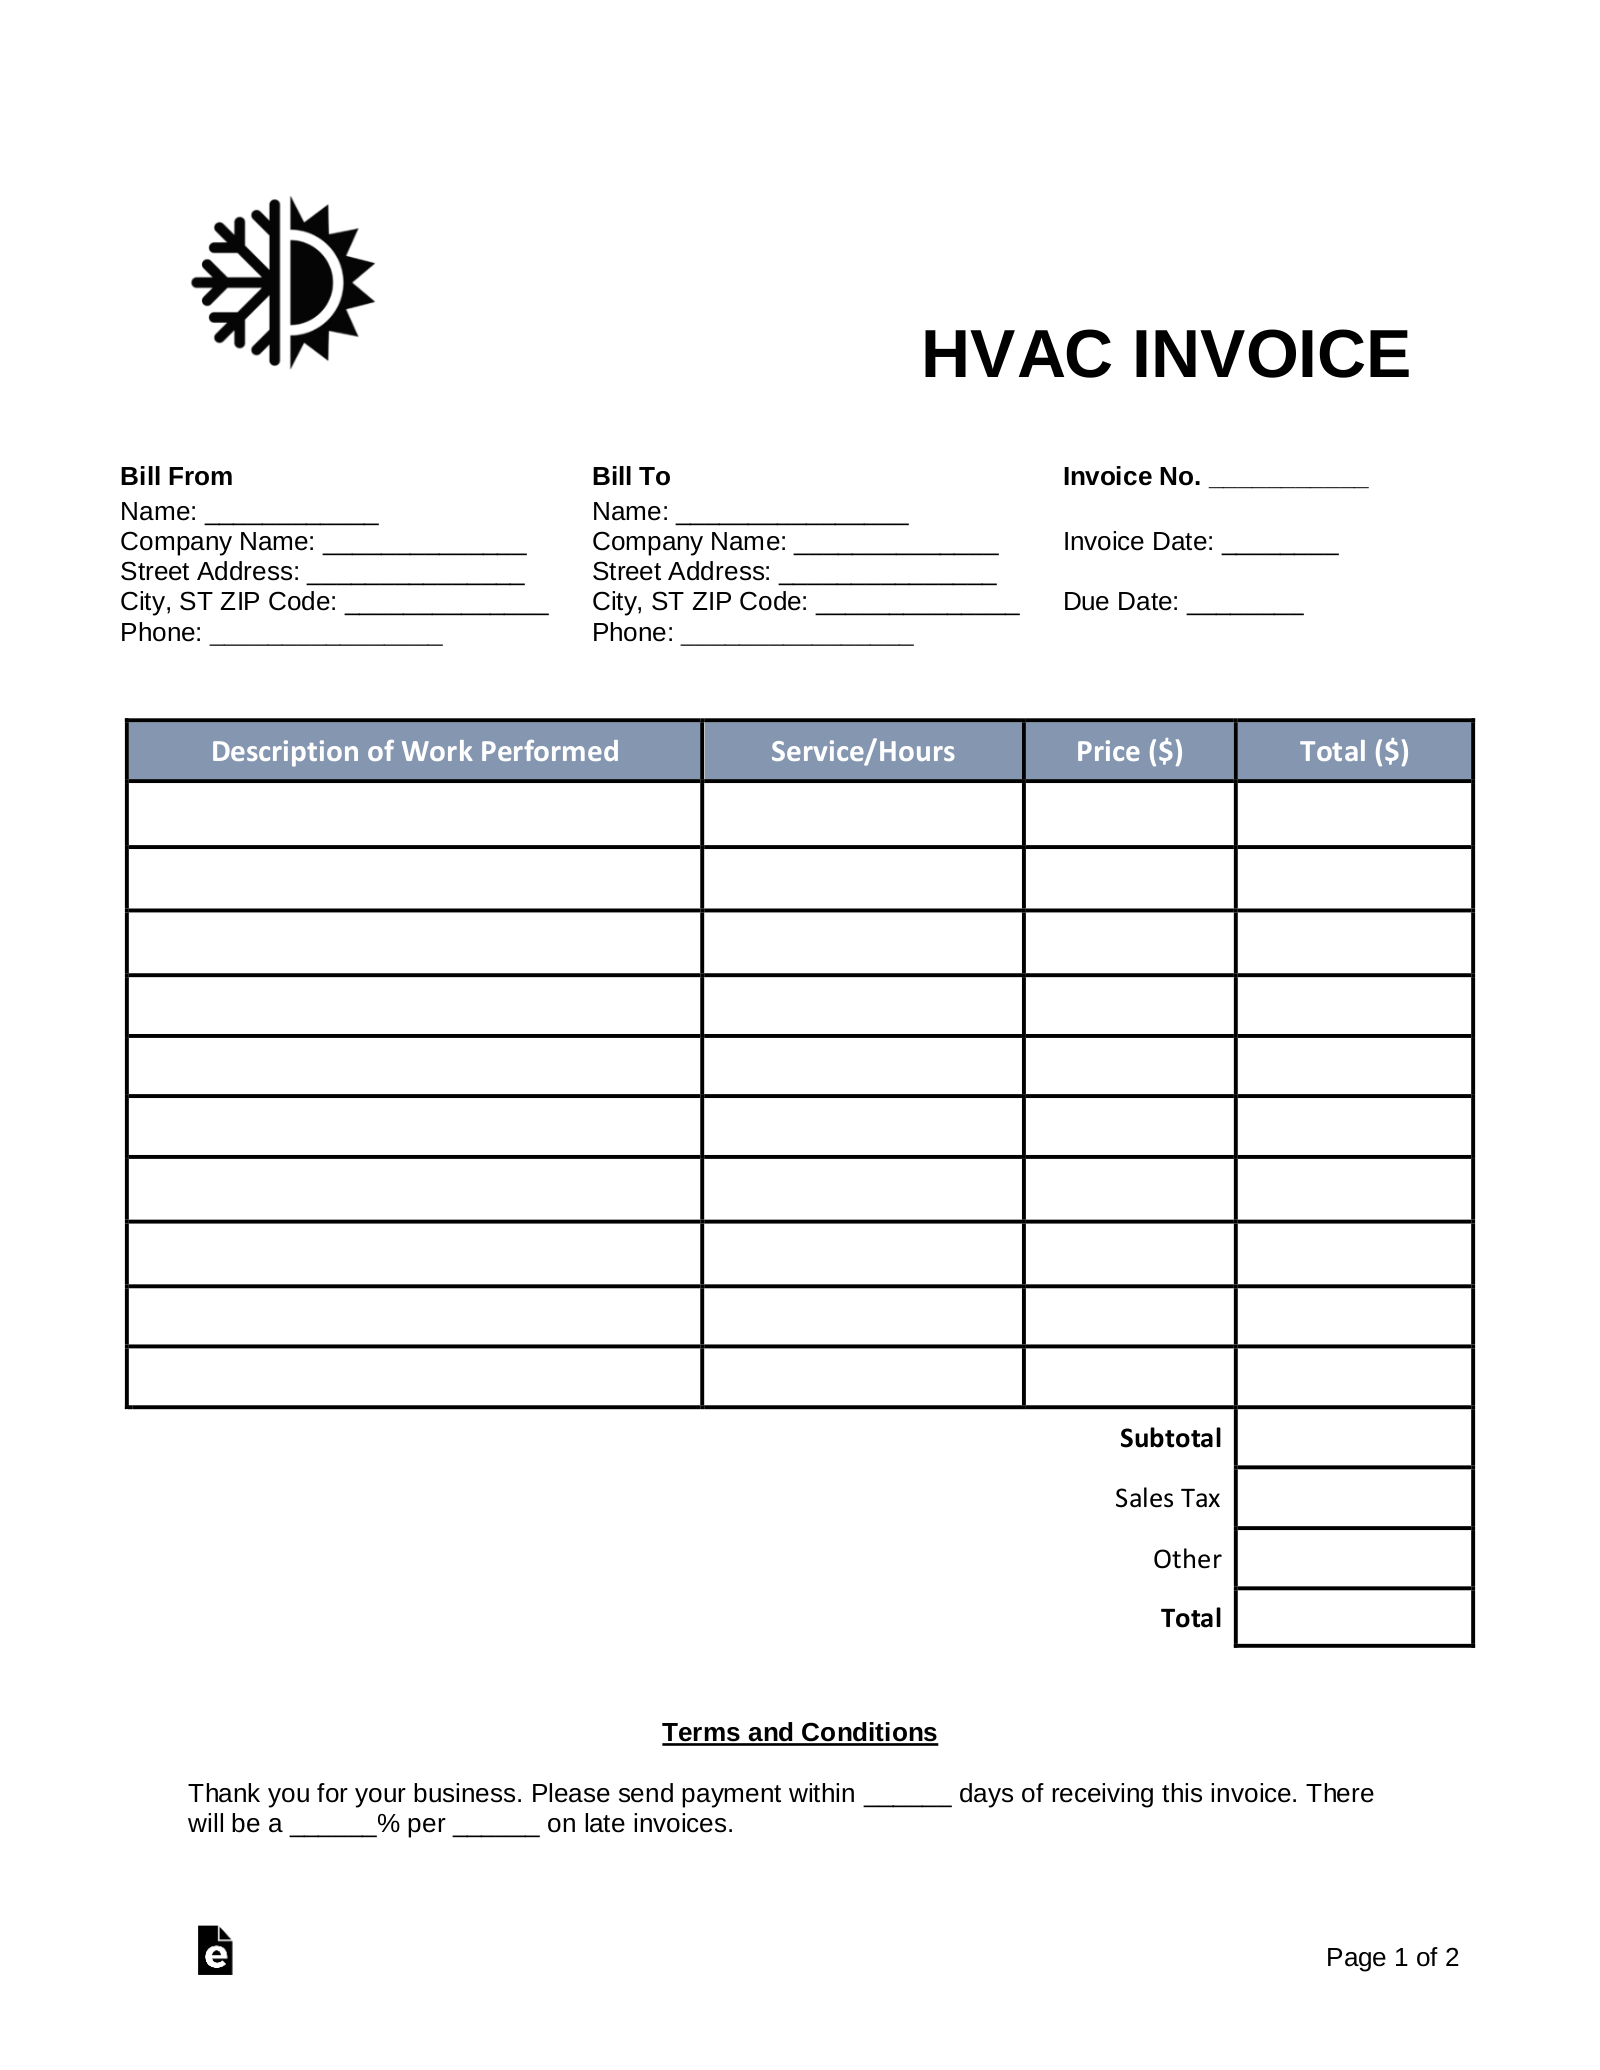 Free HVAC Invoice Template - Word   PDF   eForms - Free ...